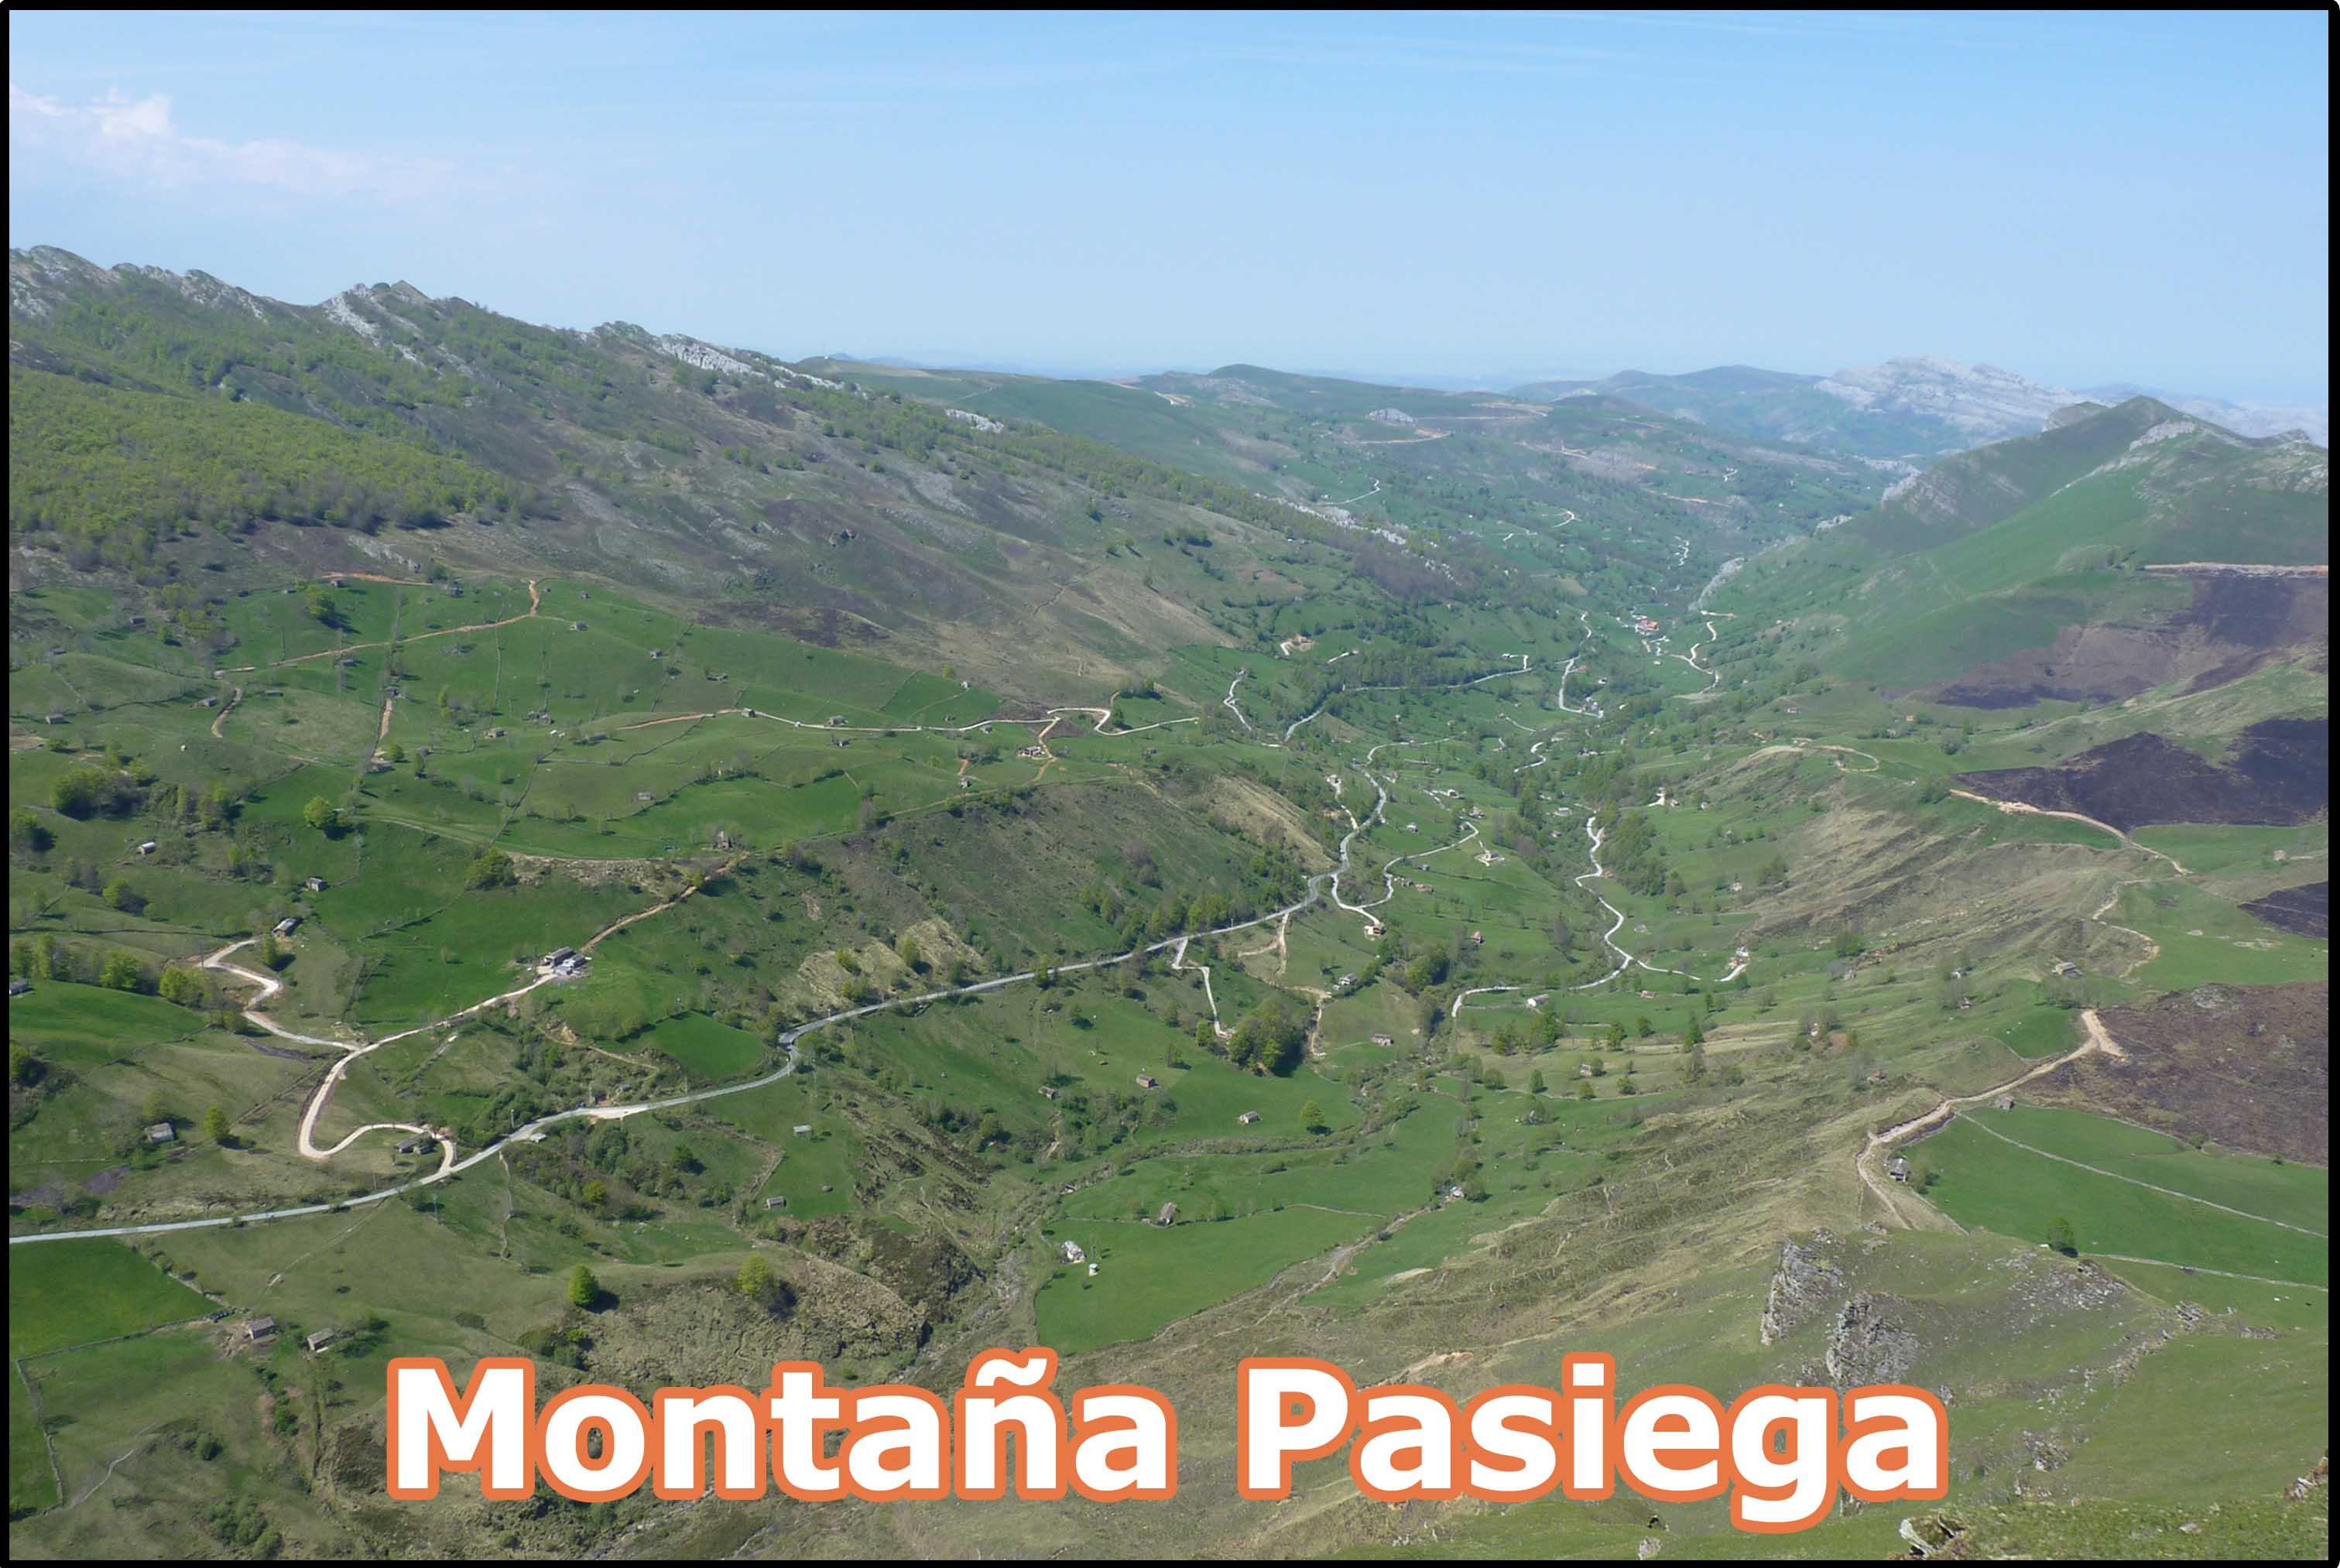 MontañaPasiega2